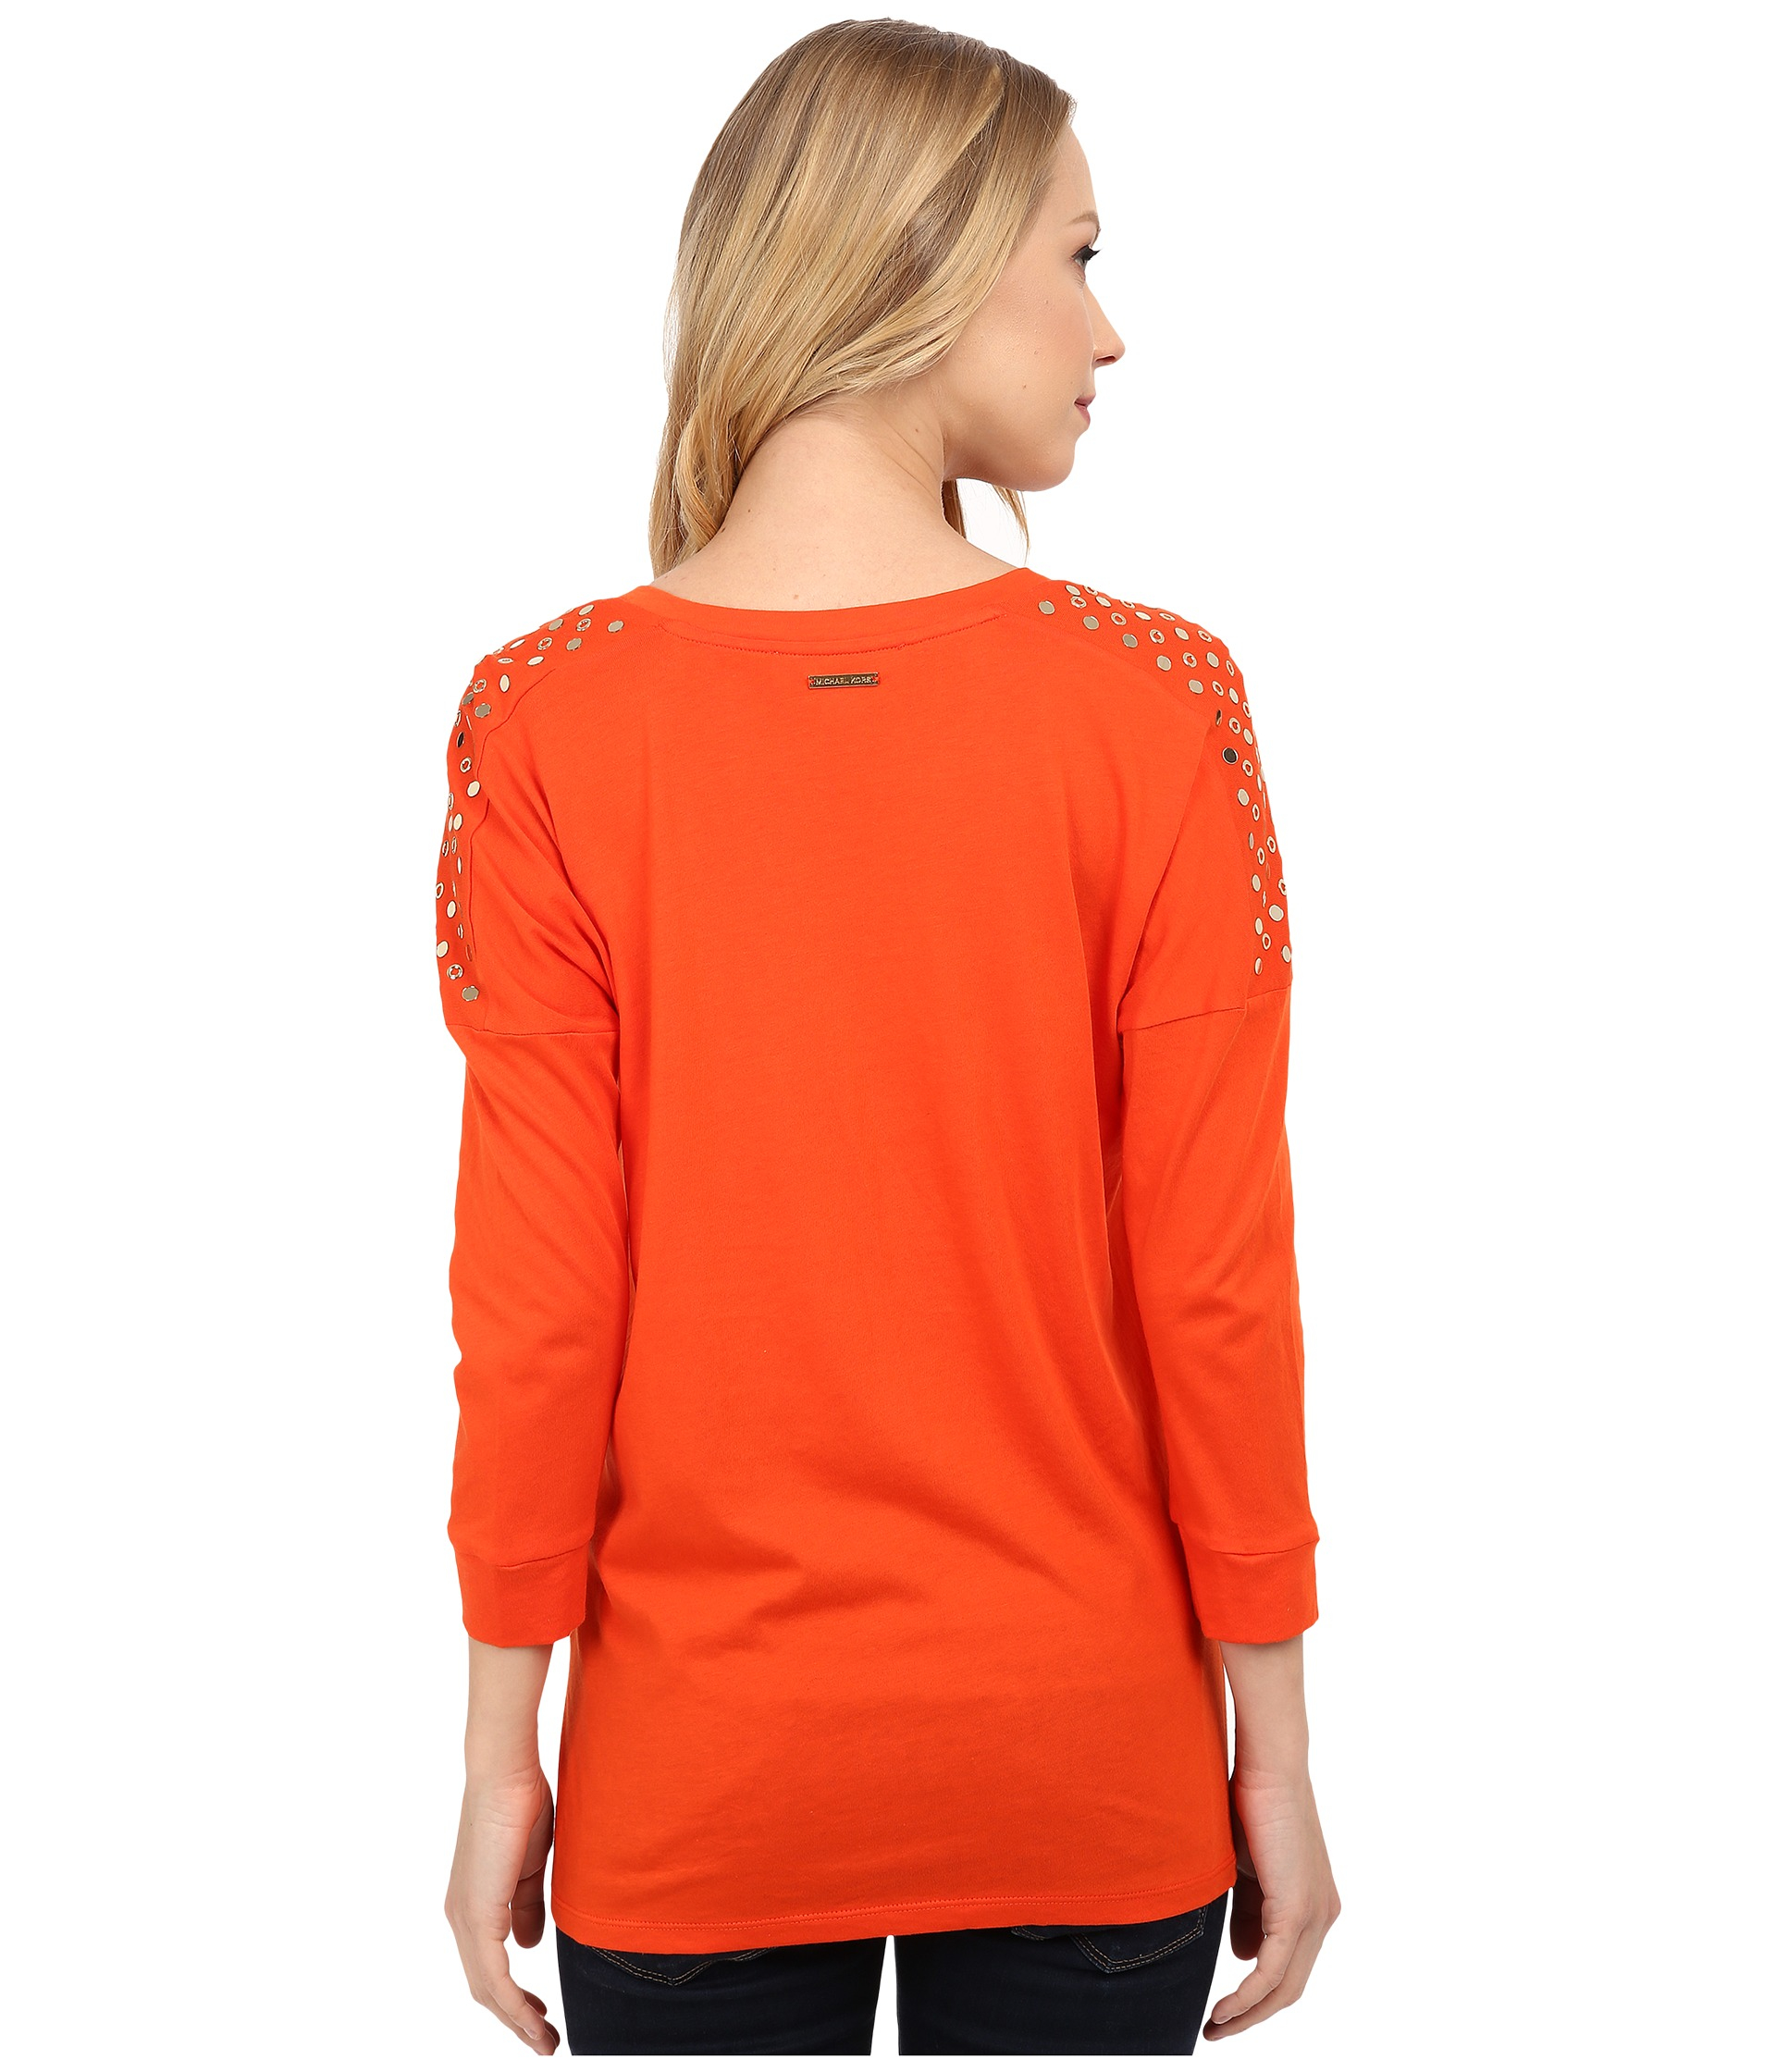 b9a86c6d71a Lyst - MICHAEL Michael Kors Stud Shoulder 3 4 Sleeve V-neck in Orange